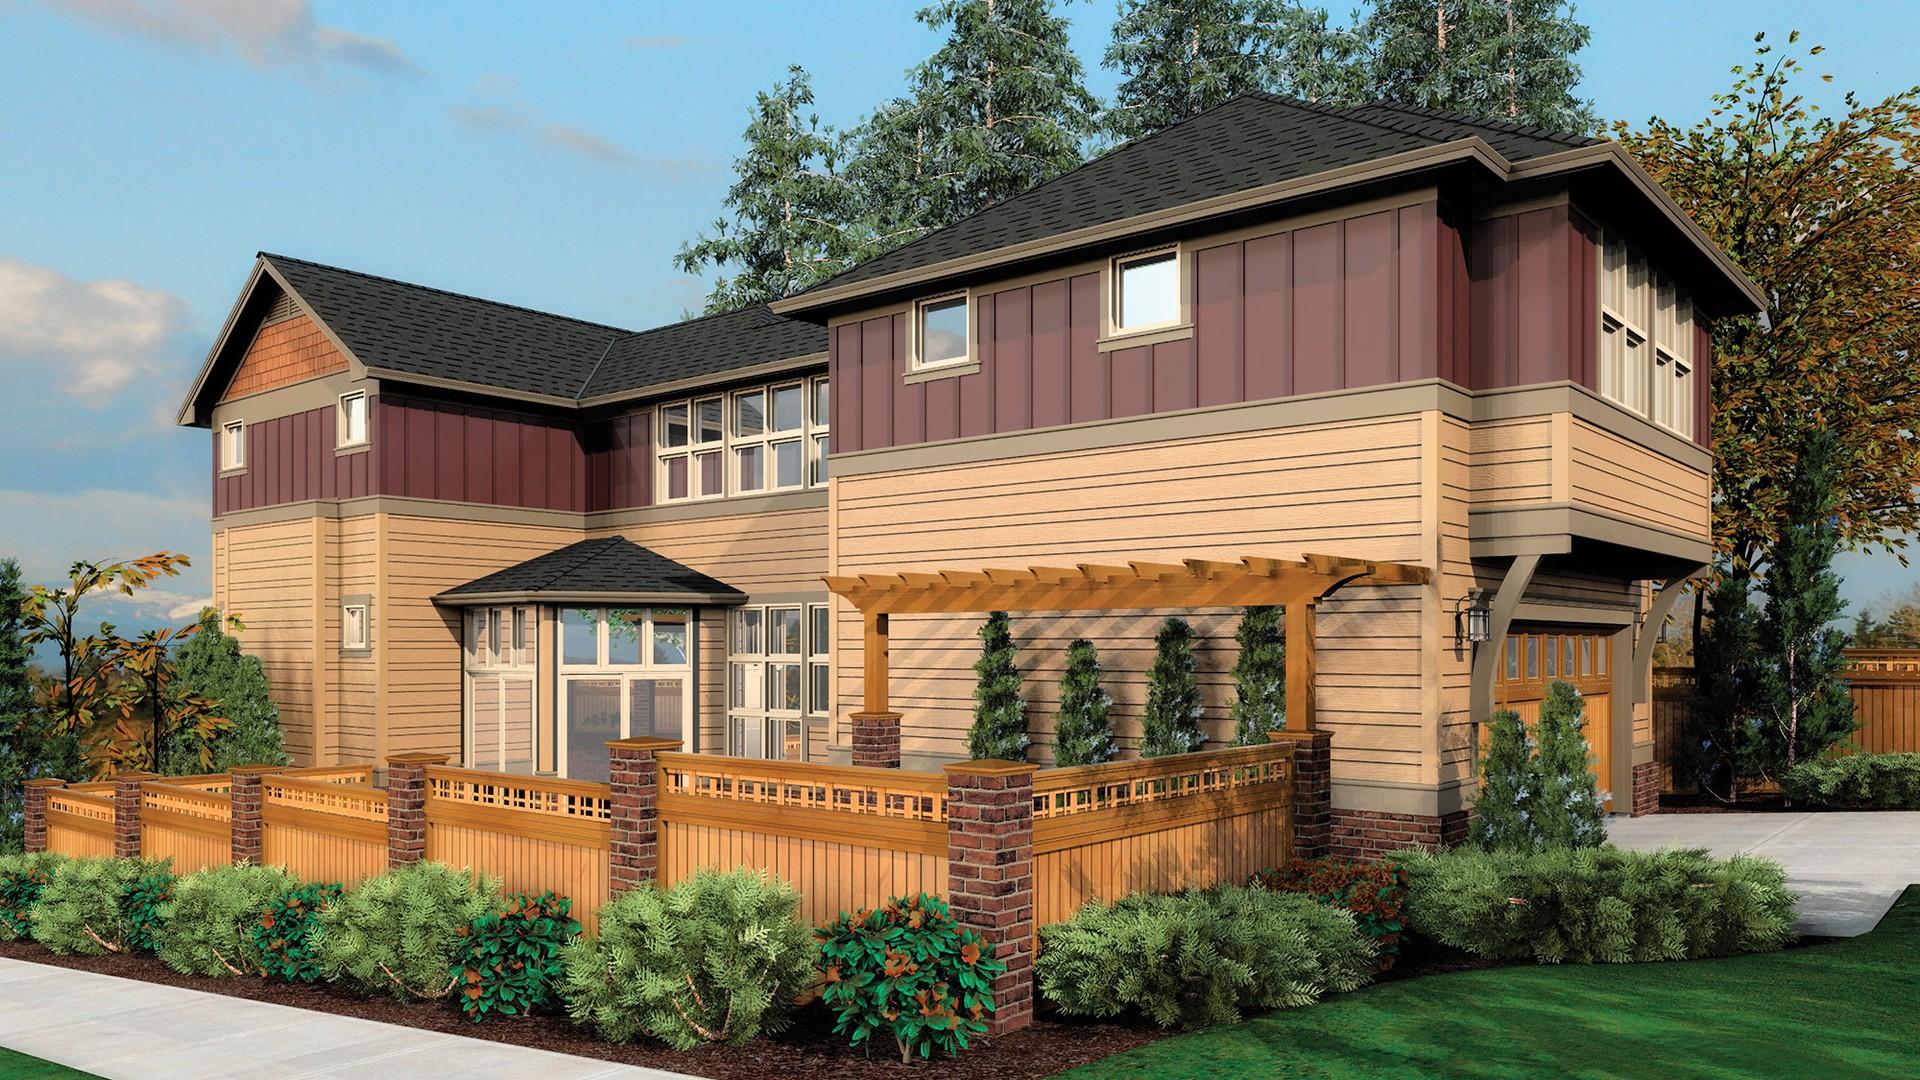 The Nichols Plan 22164 Traditional House Plan